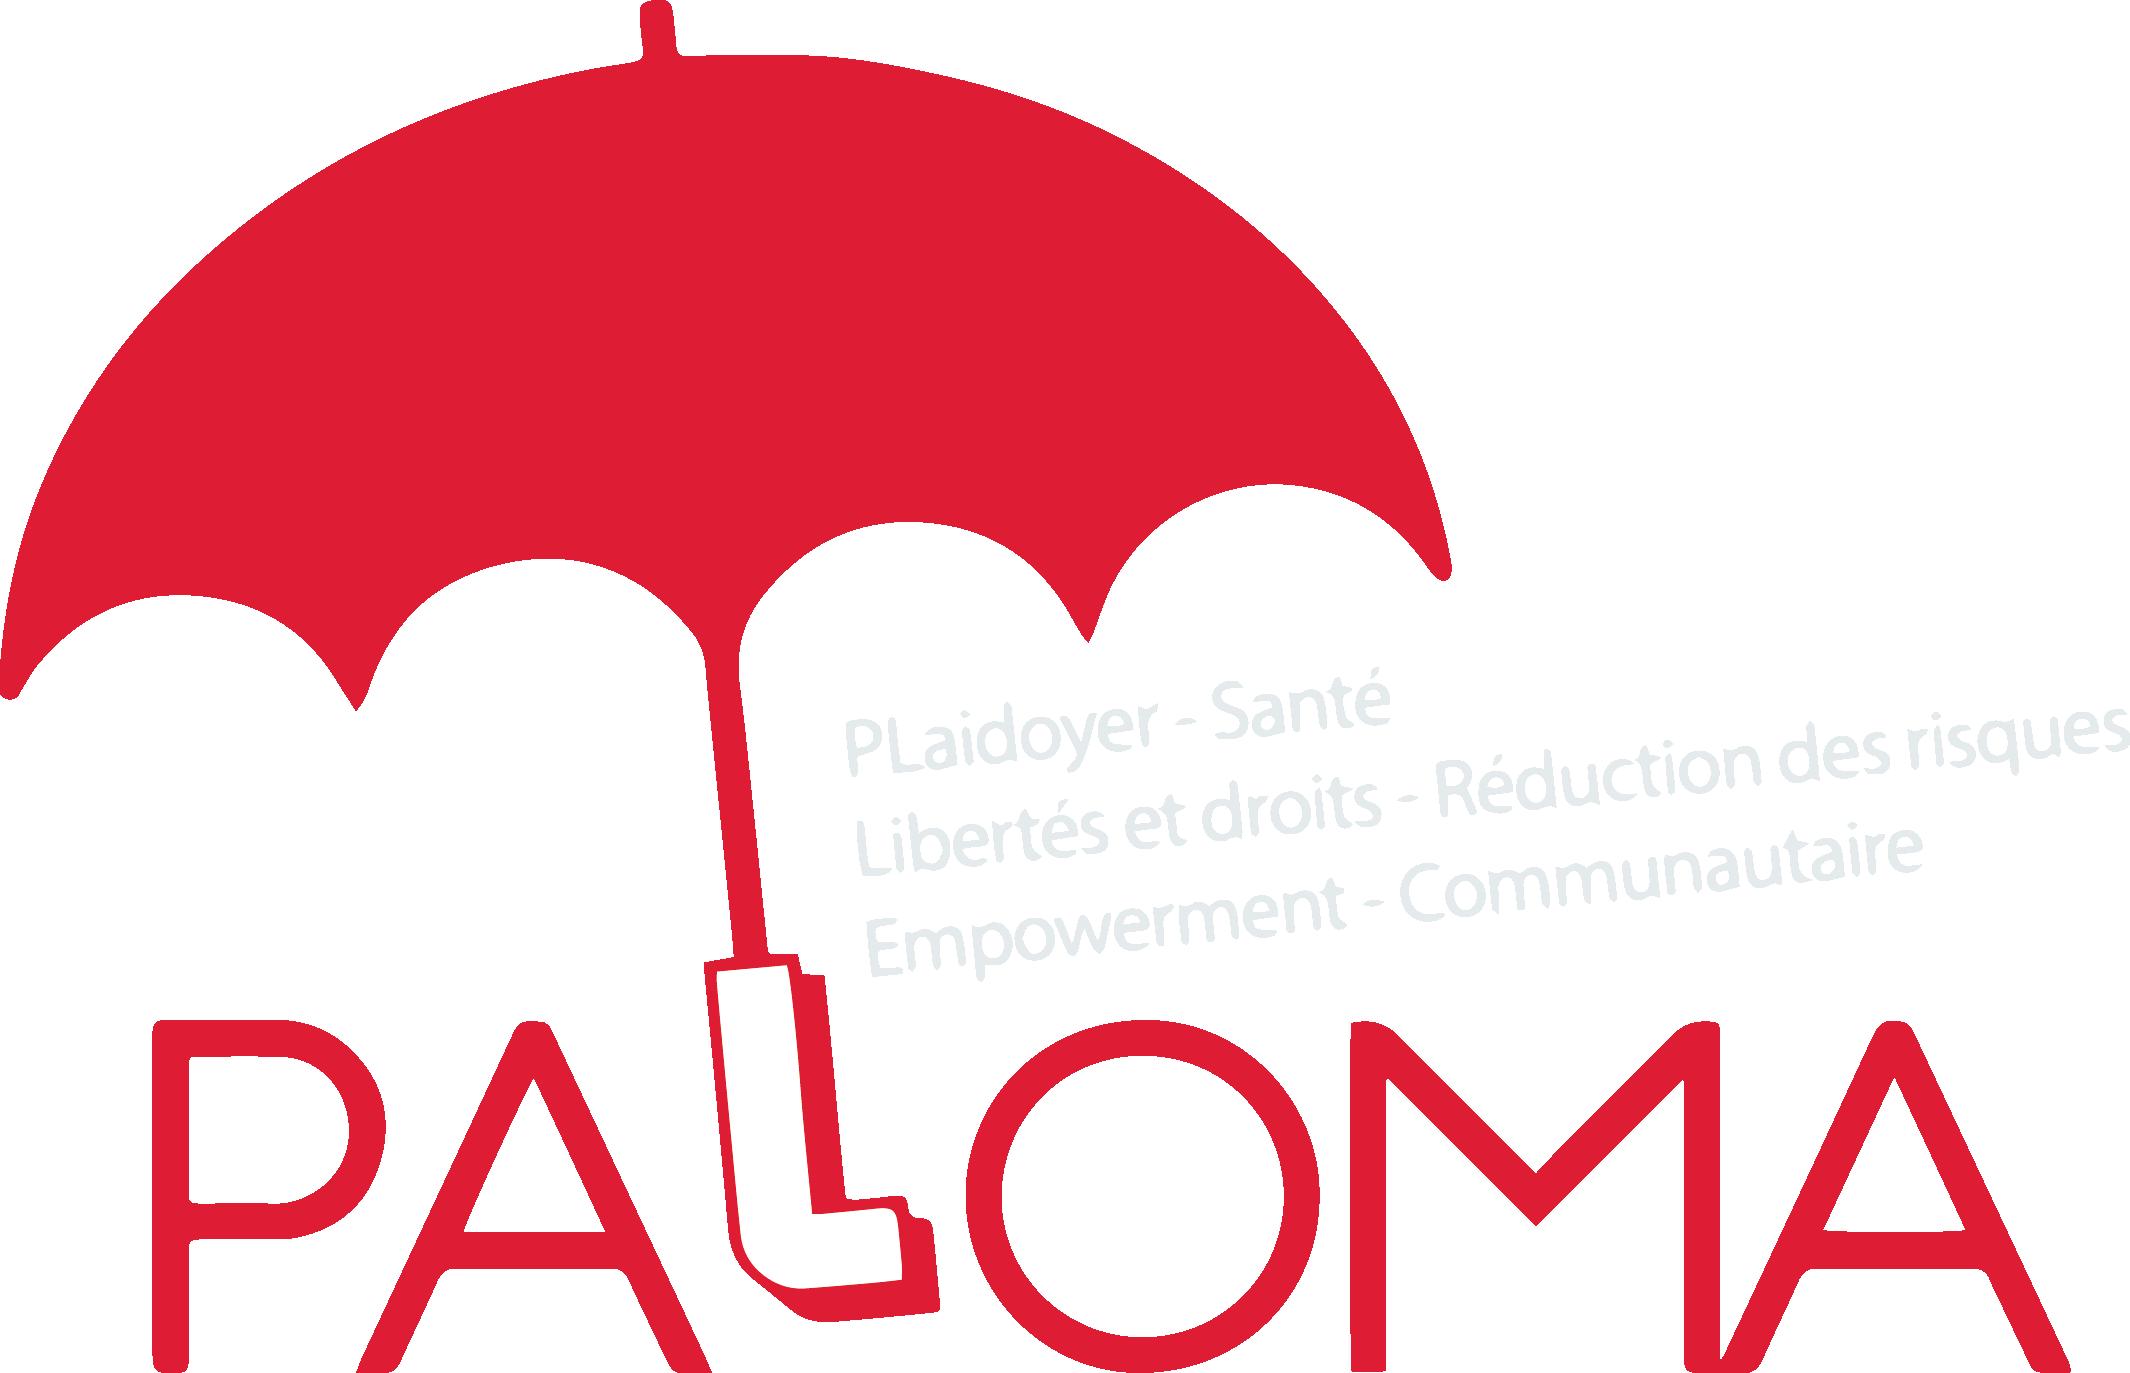 logo paloma png